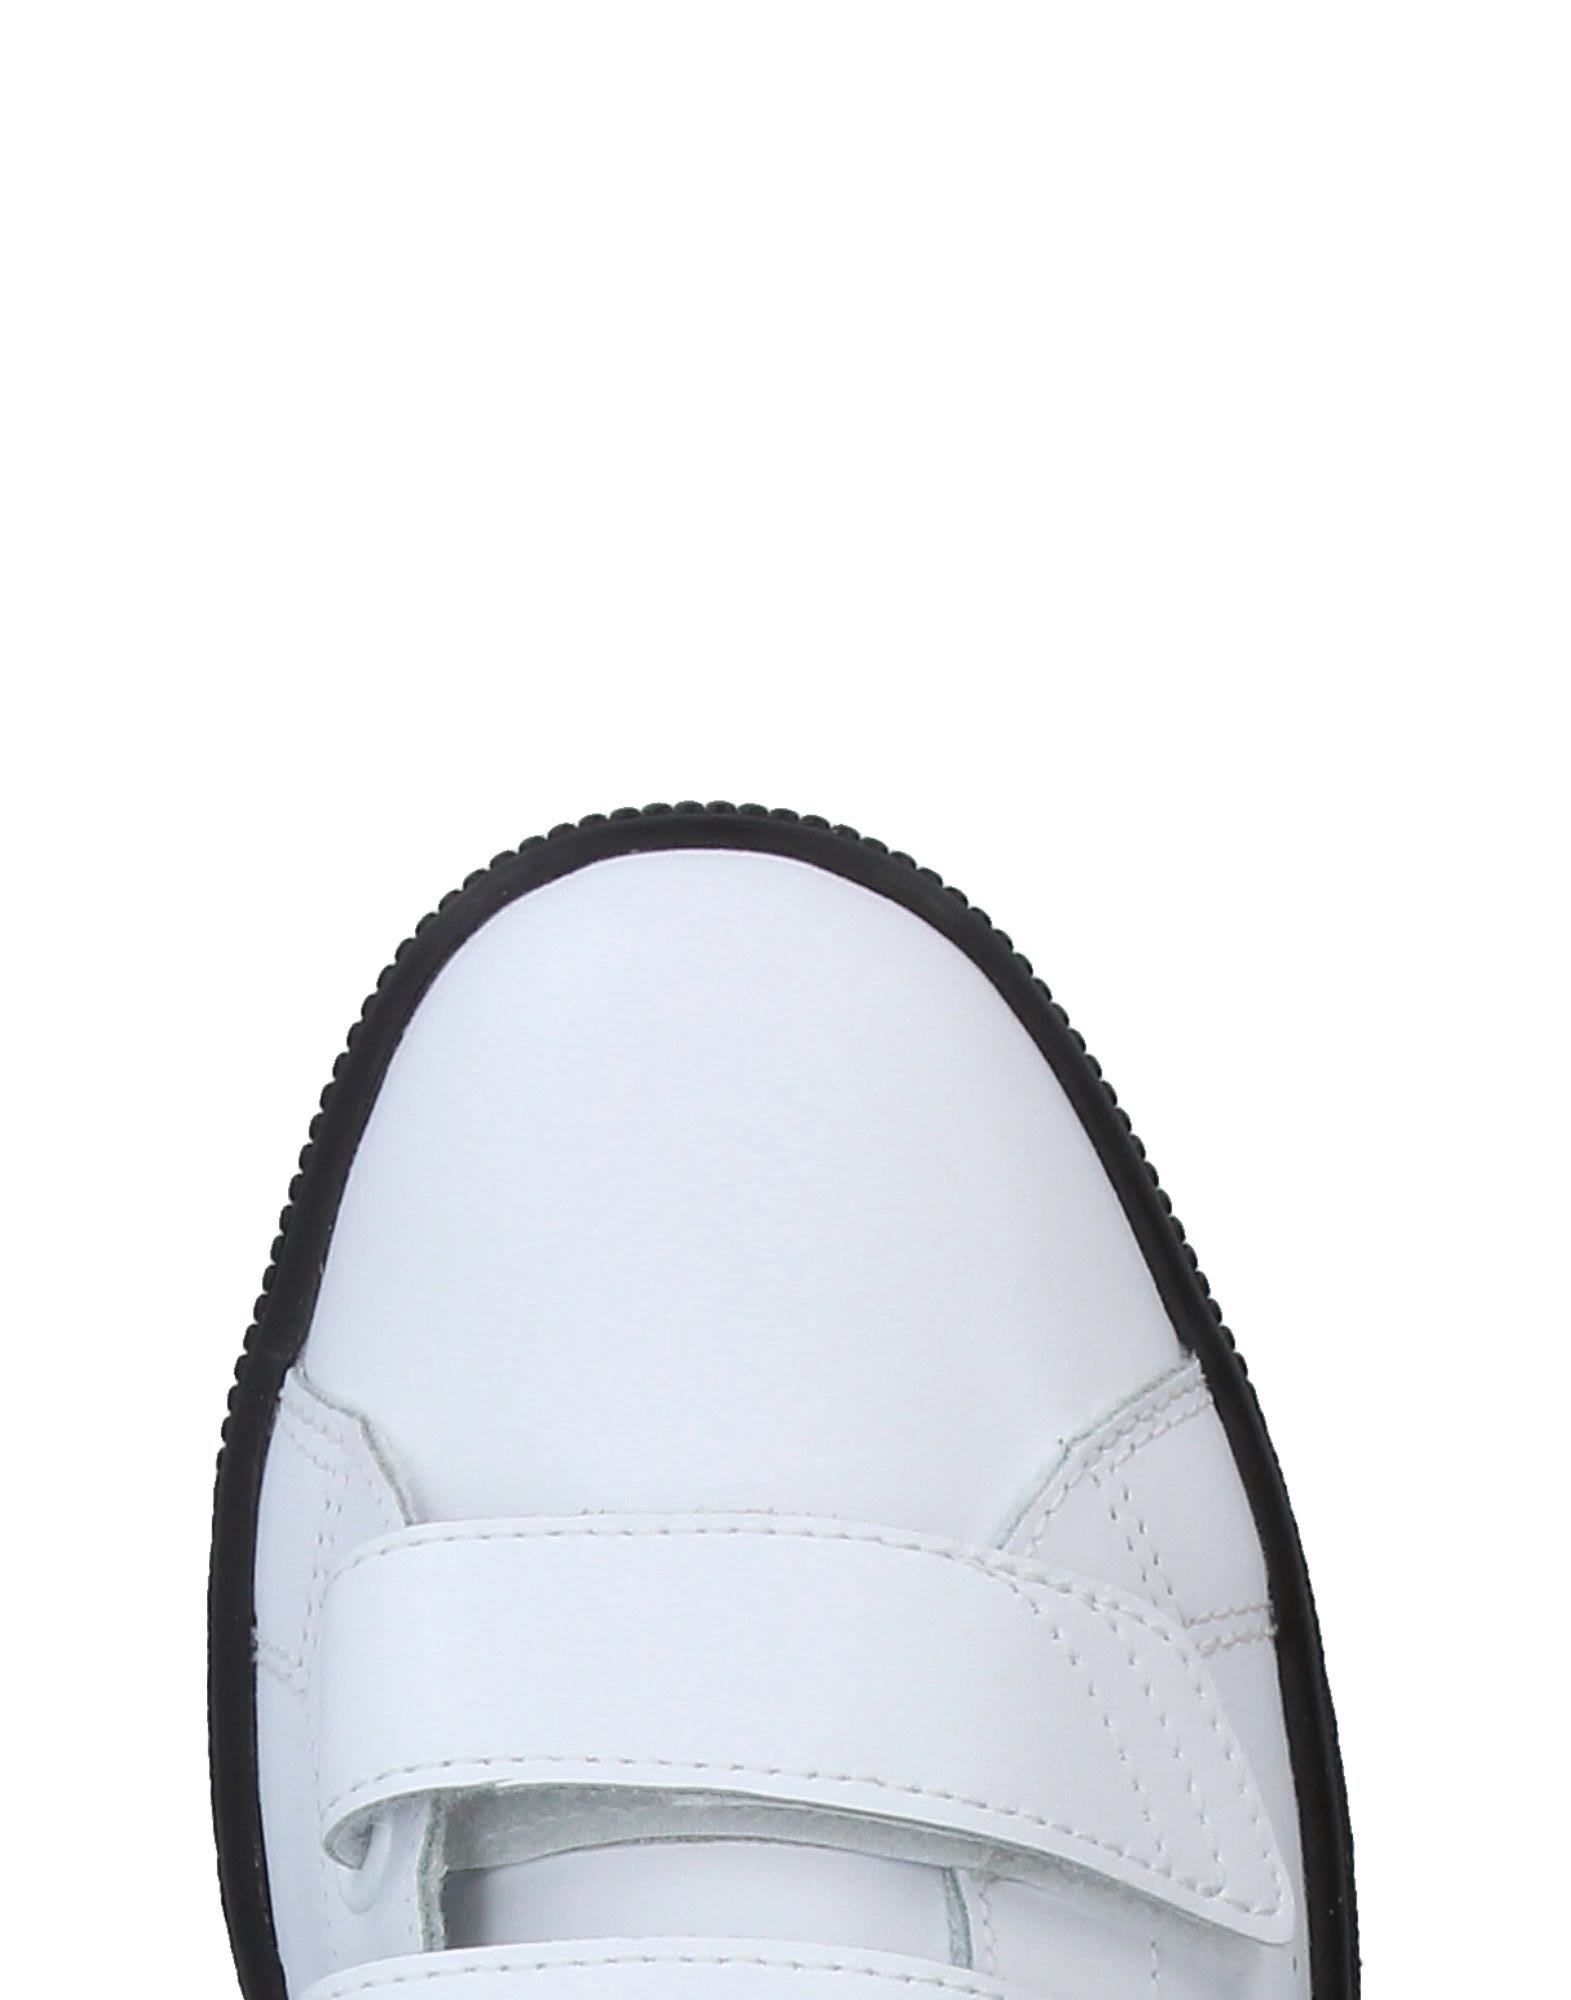 11333676XG Puma Sneakers Herren  11333676XG  Heiße Schuhe 5b6aa2